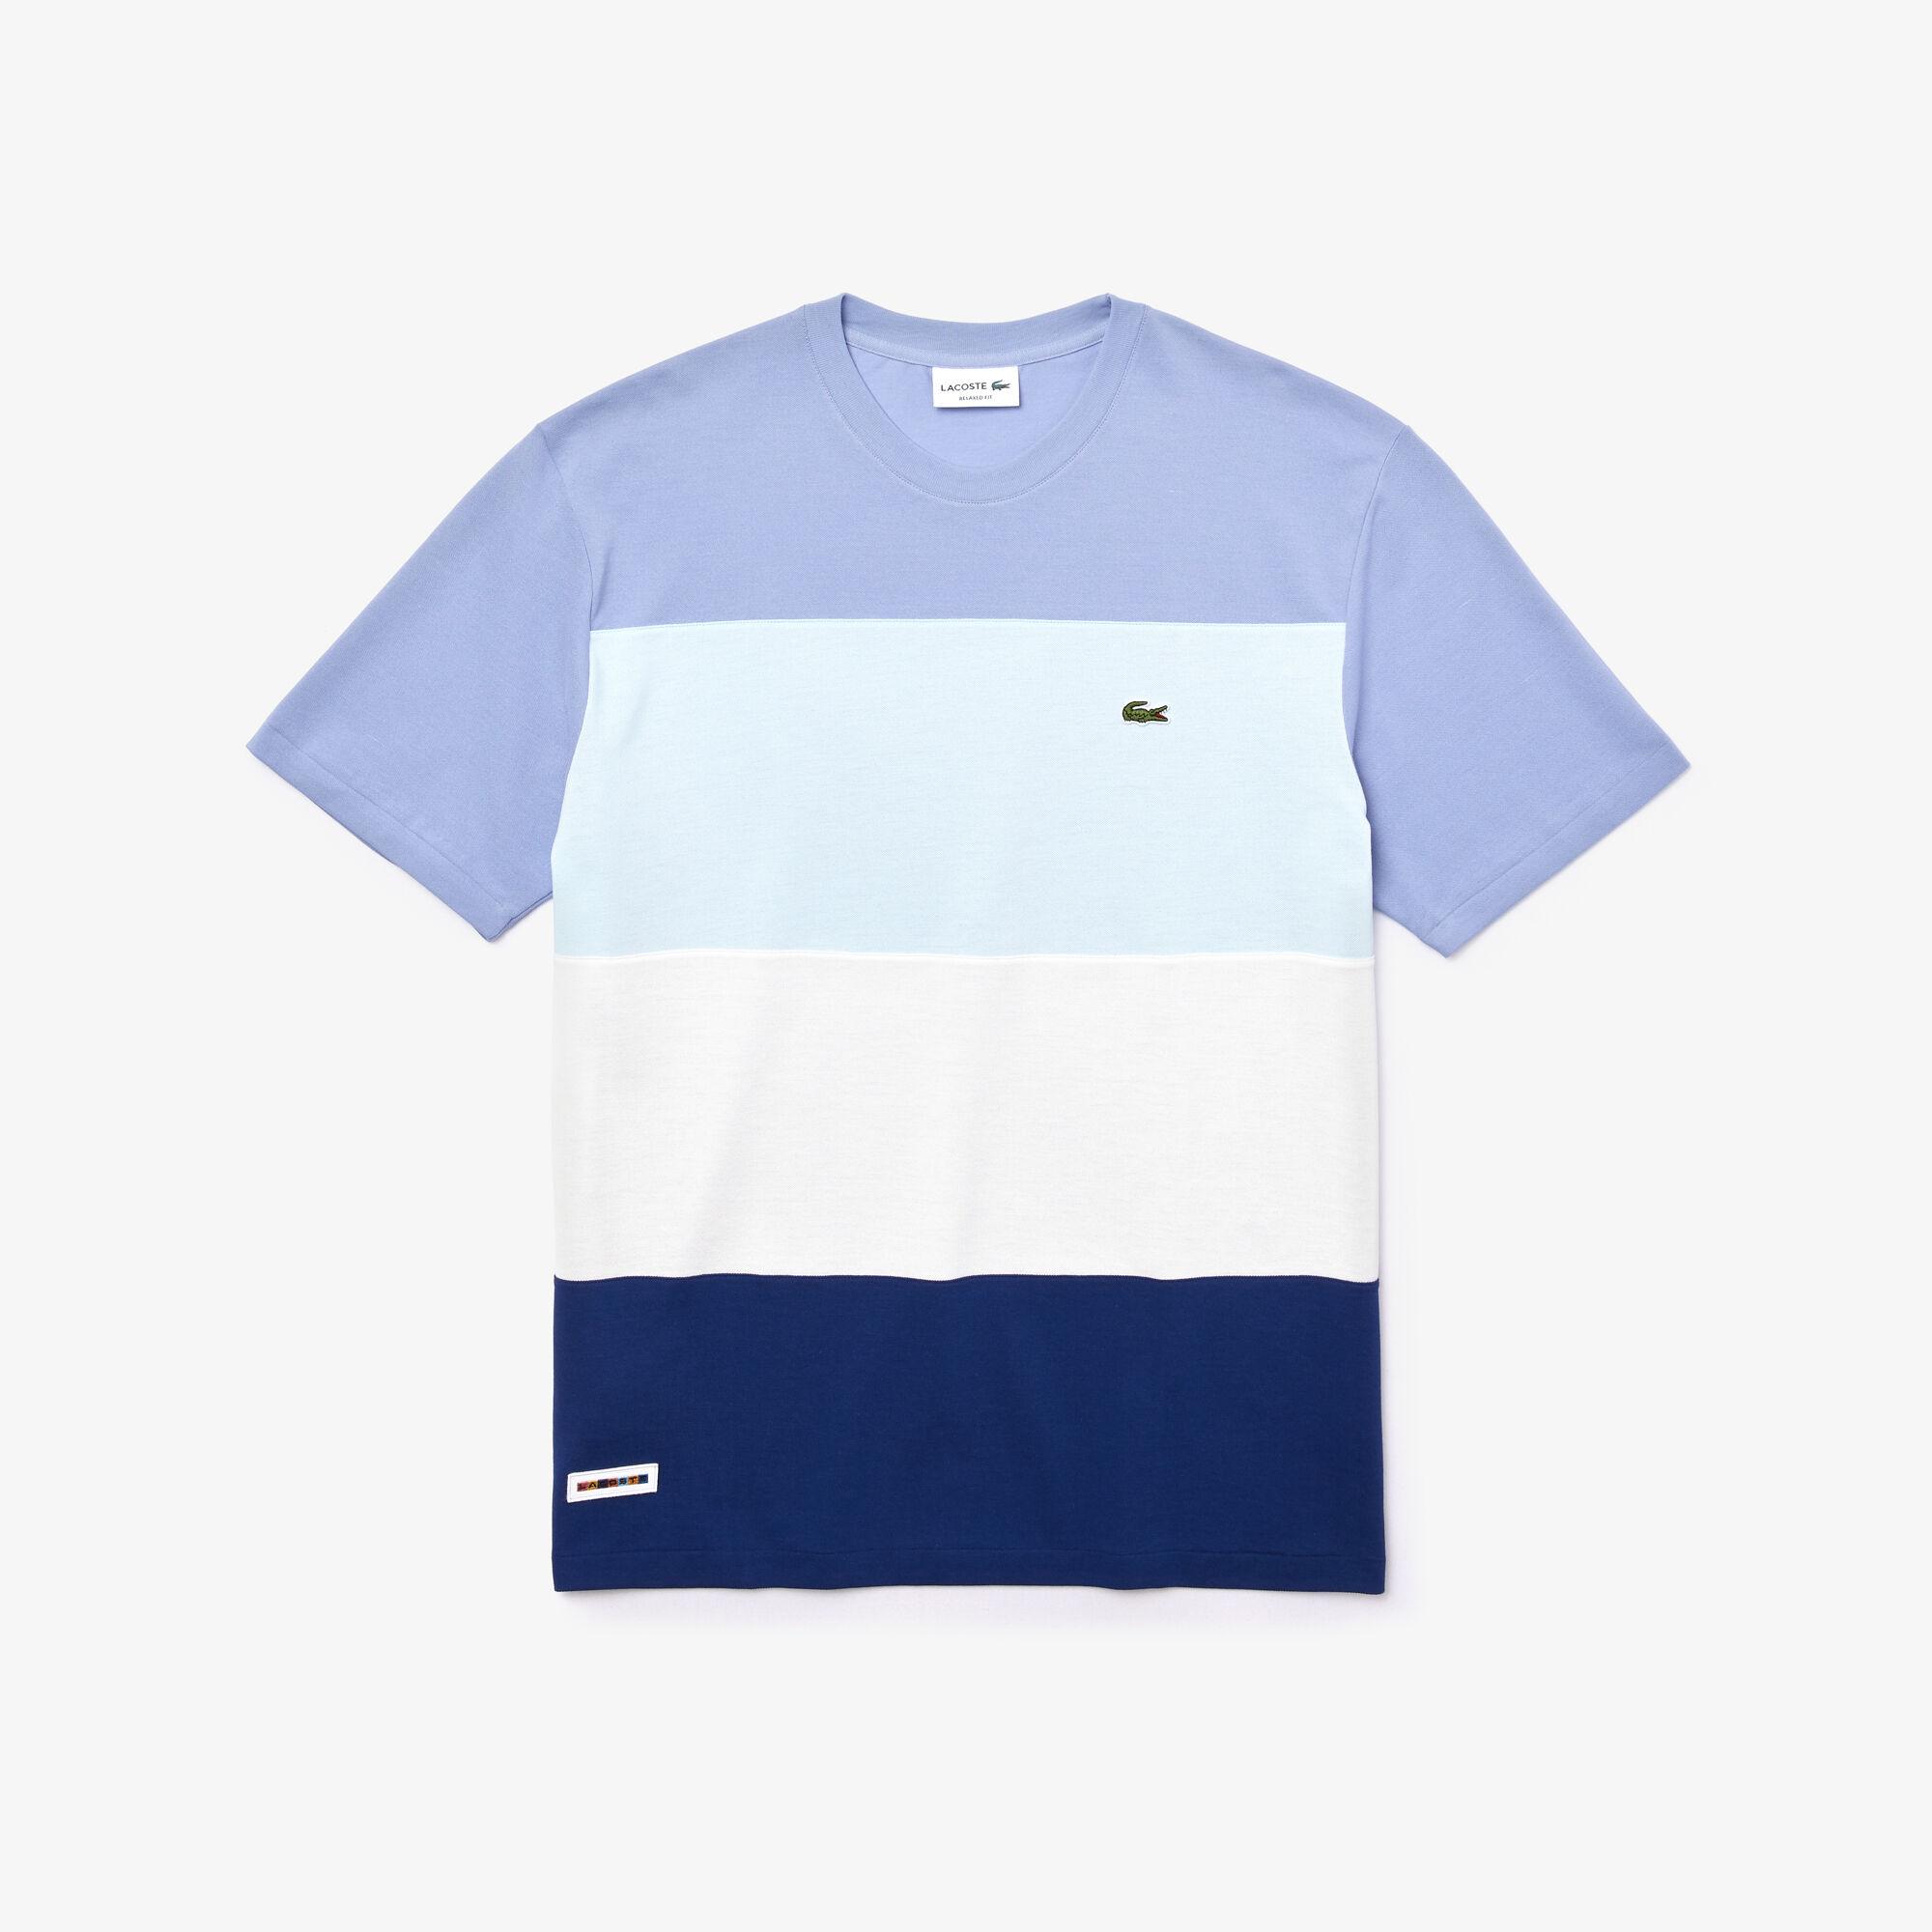 Men's Colourblock Striped Cotton Piqué Crew Neck T-shirt